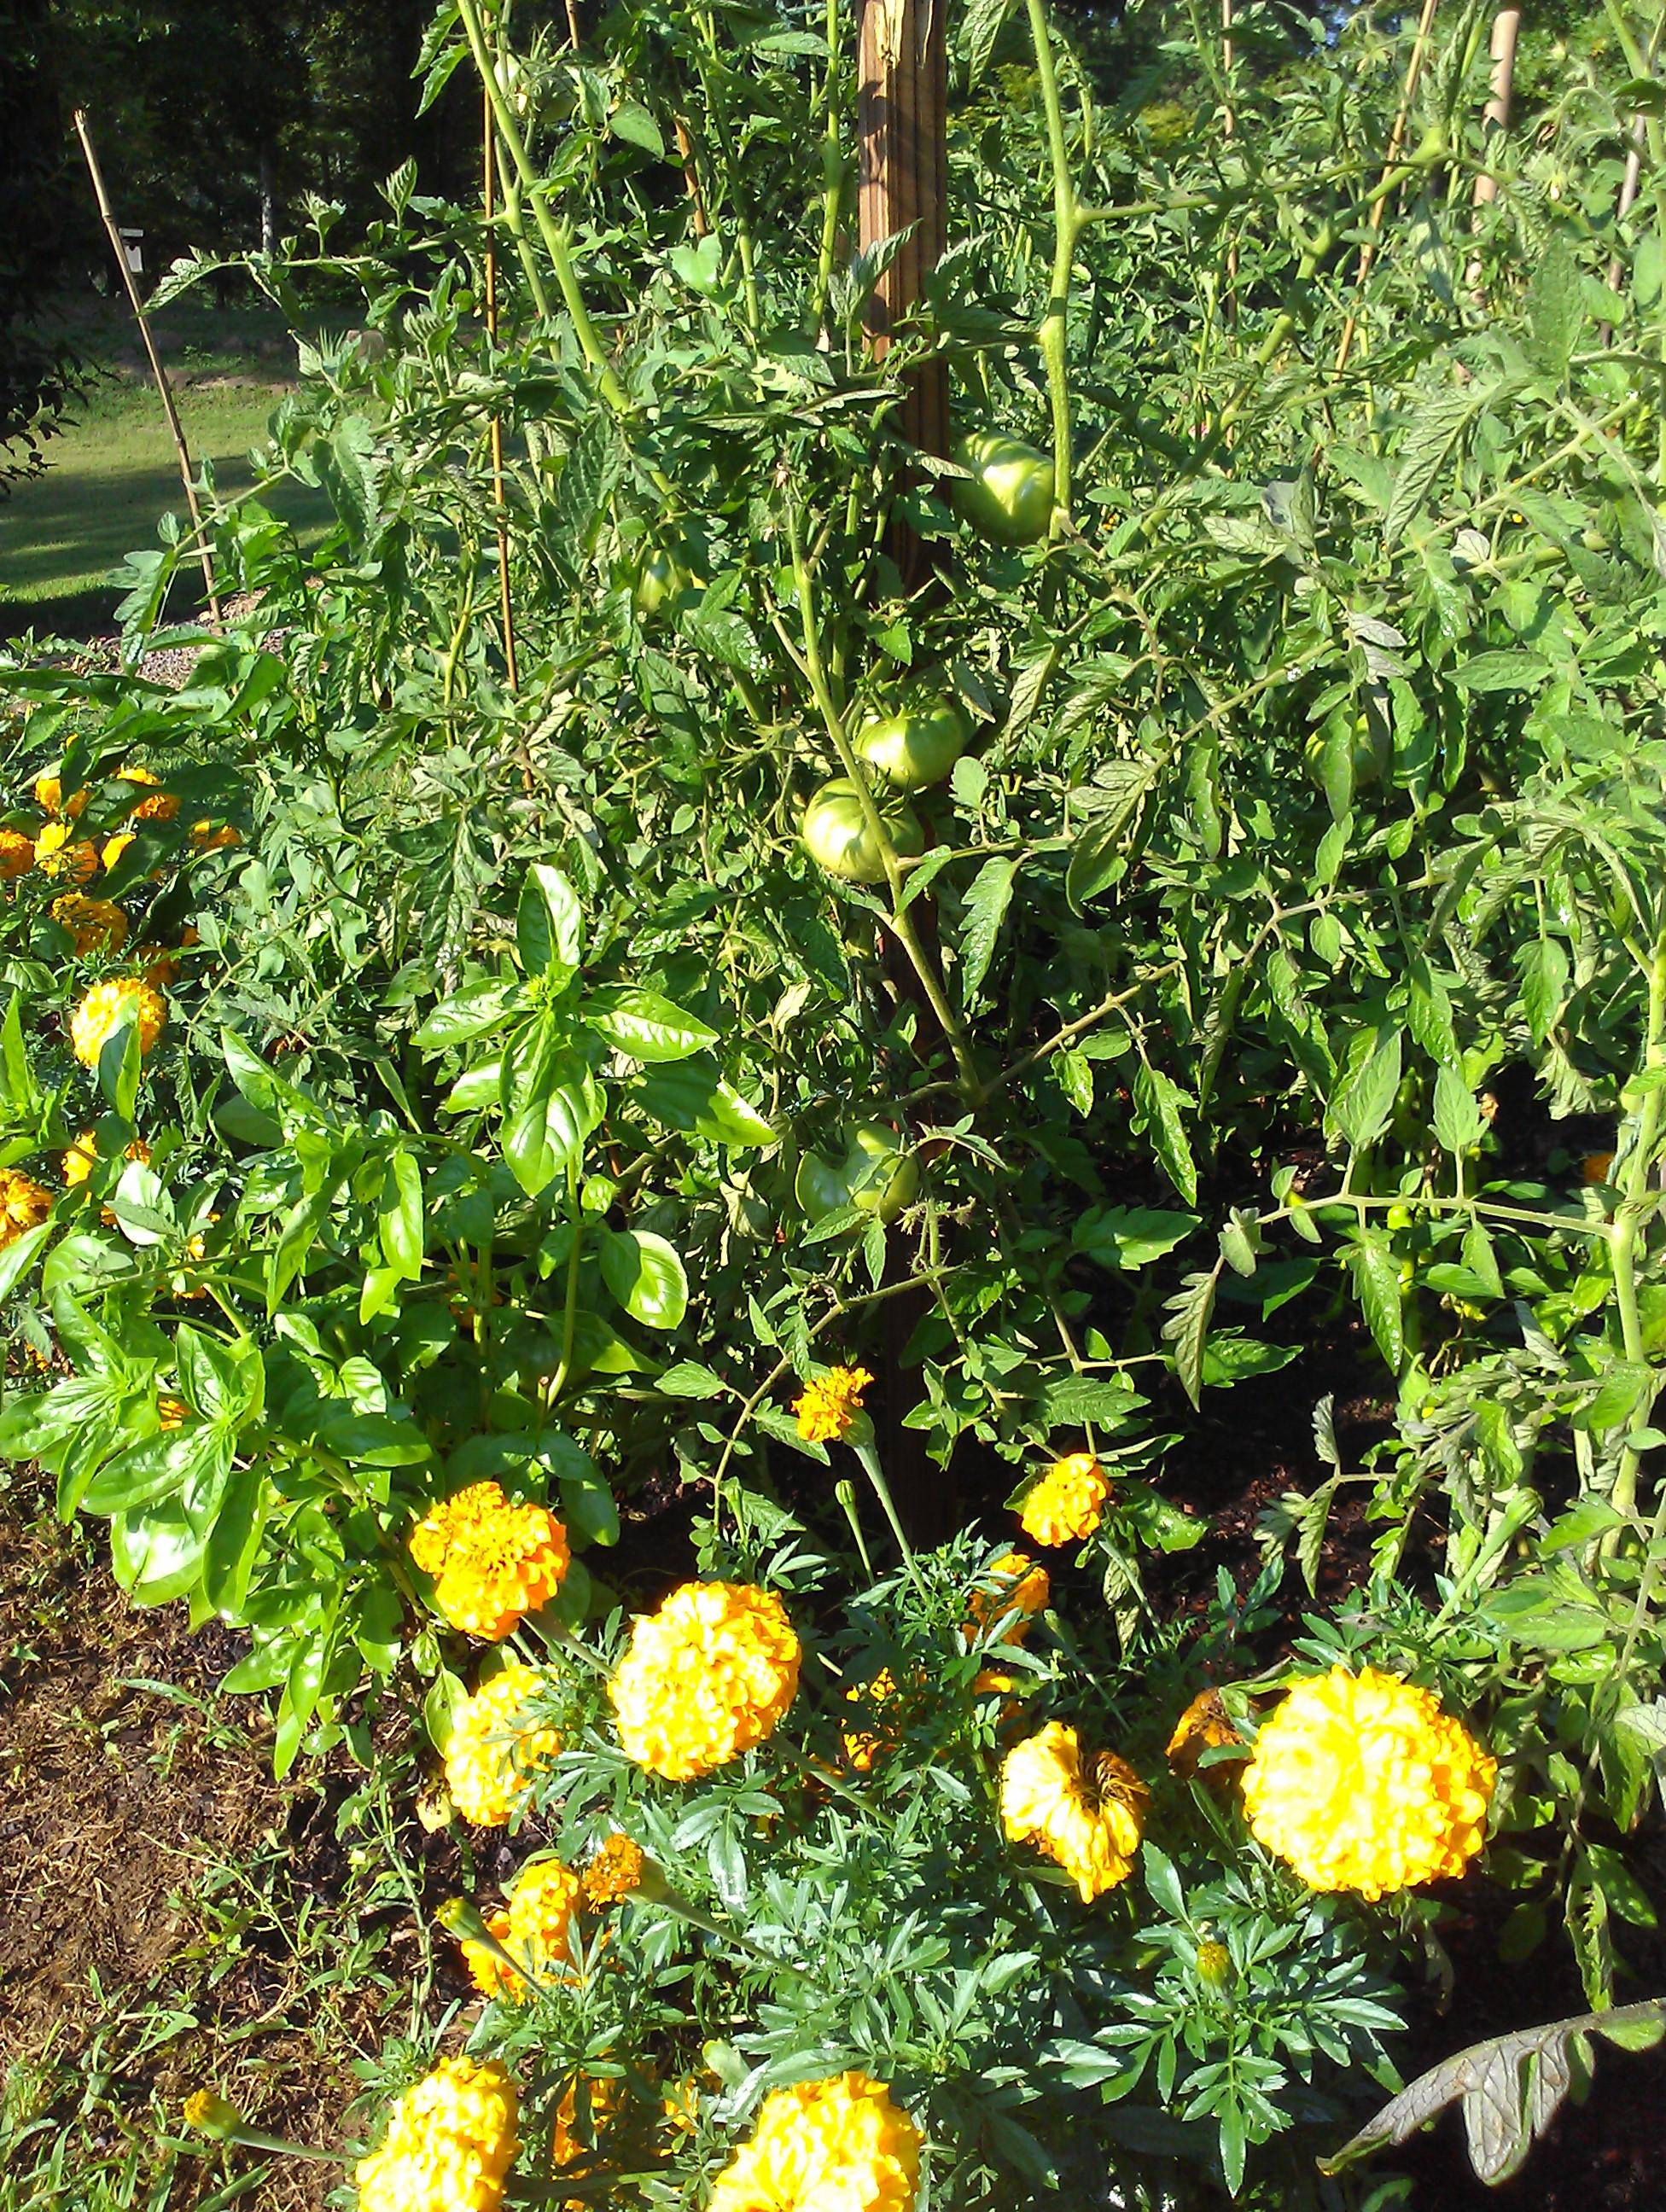 Marigolds, Basil & Tomatoes